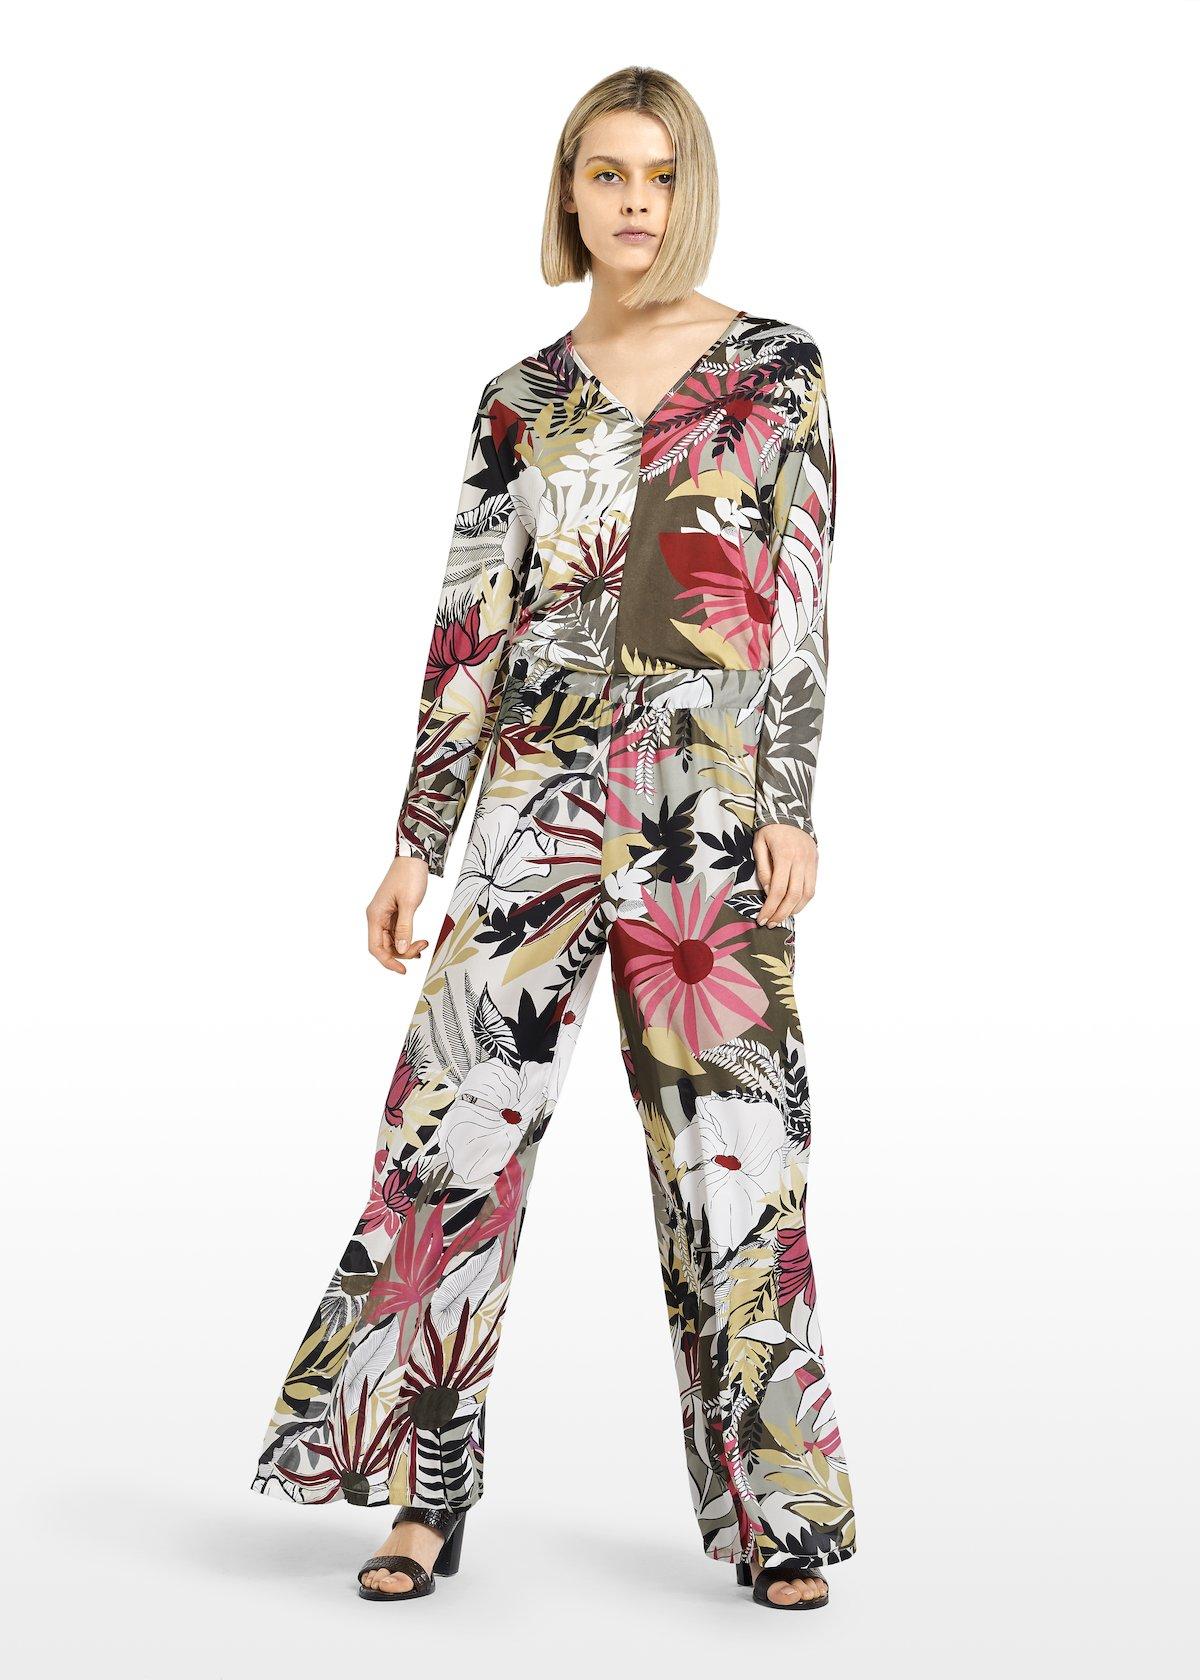 Bali print Simona t-shirt - Alga / White Fantasia - Woman - Category image